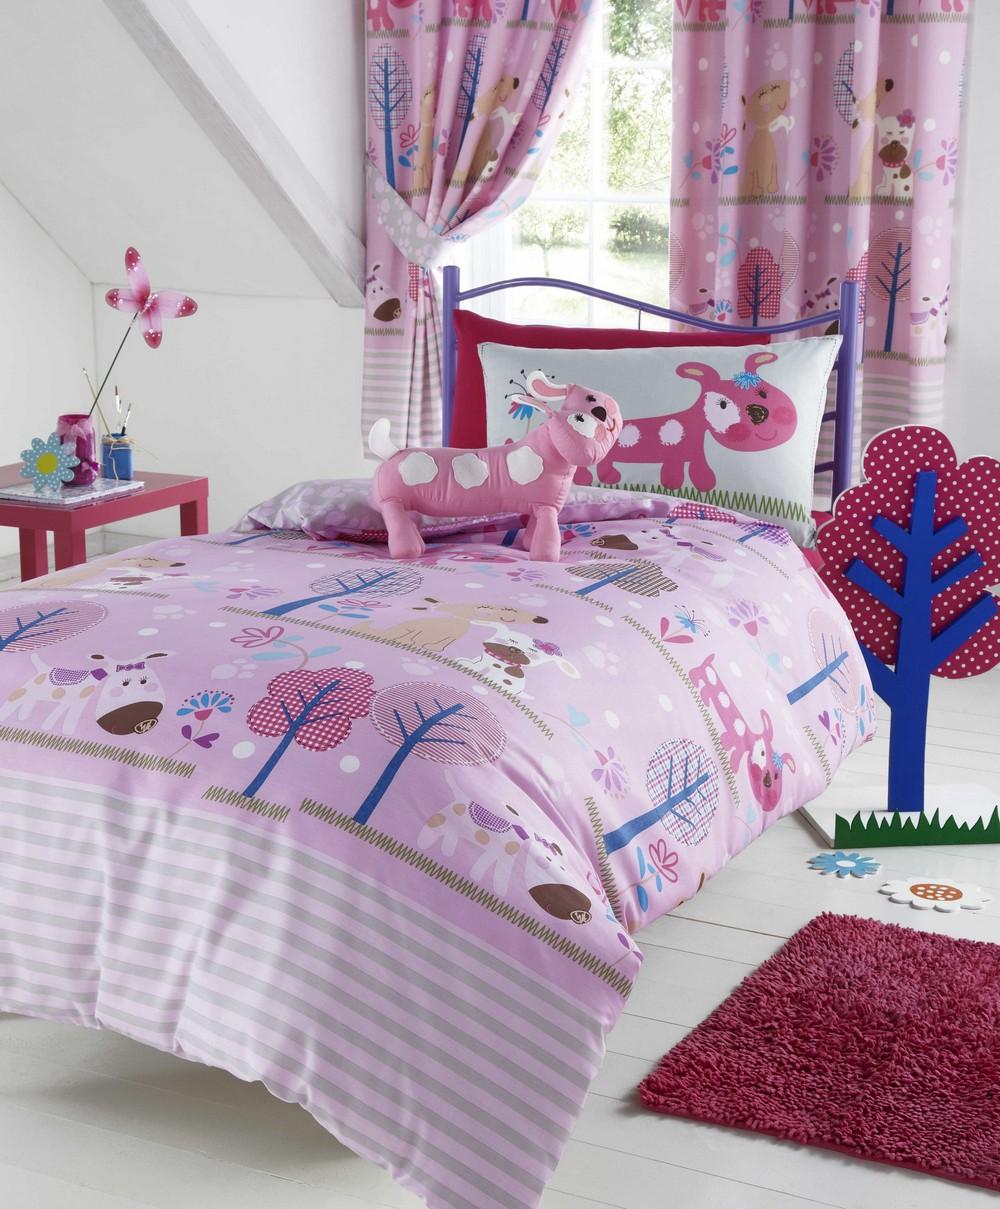 Girls Pink Pooch Puppy Dog Duvet Cover Set Bedding